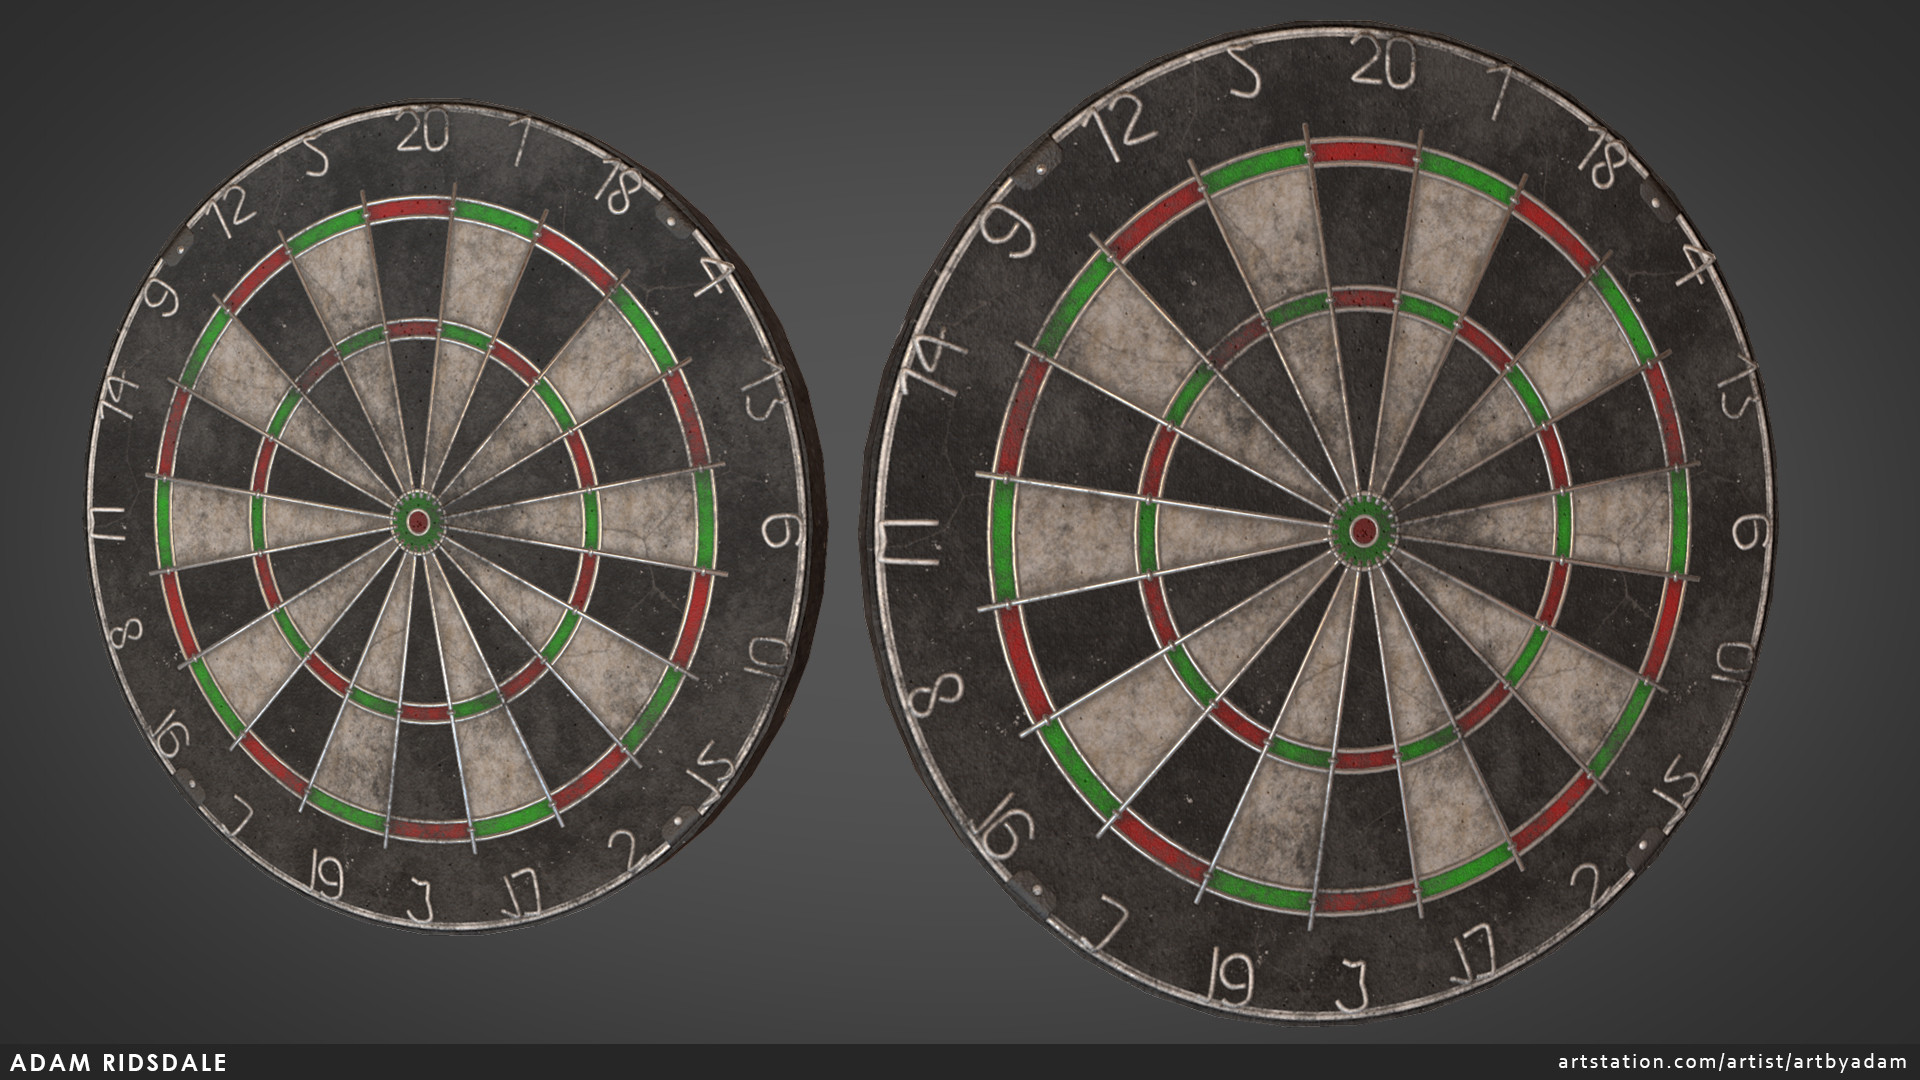 Adam ridsdale dartboard01